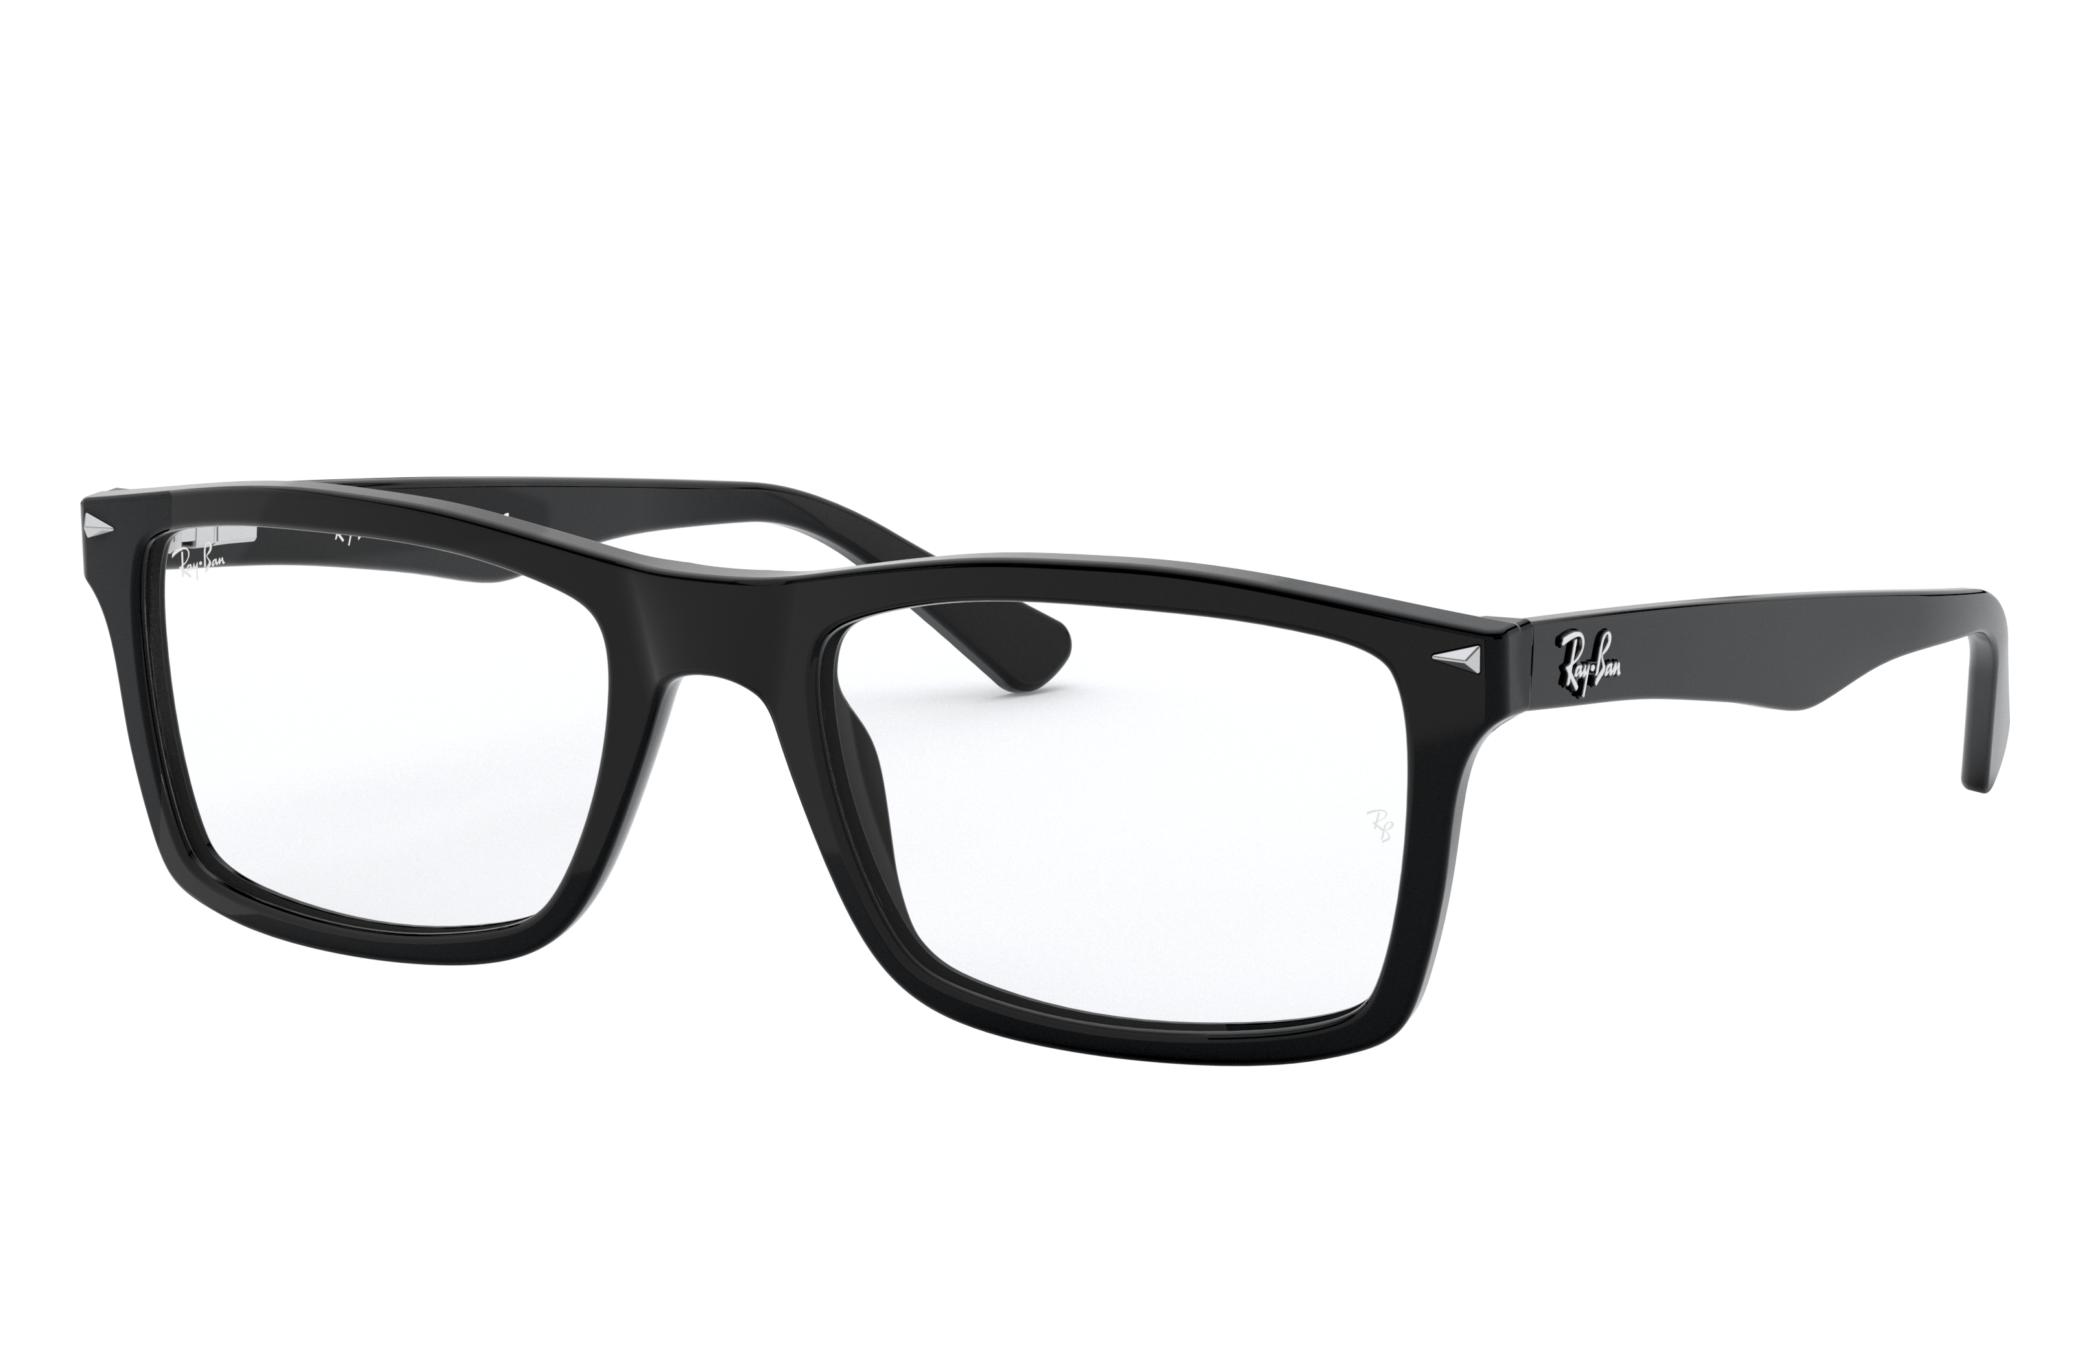 Ray-Ban prescription glasses RB5287